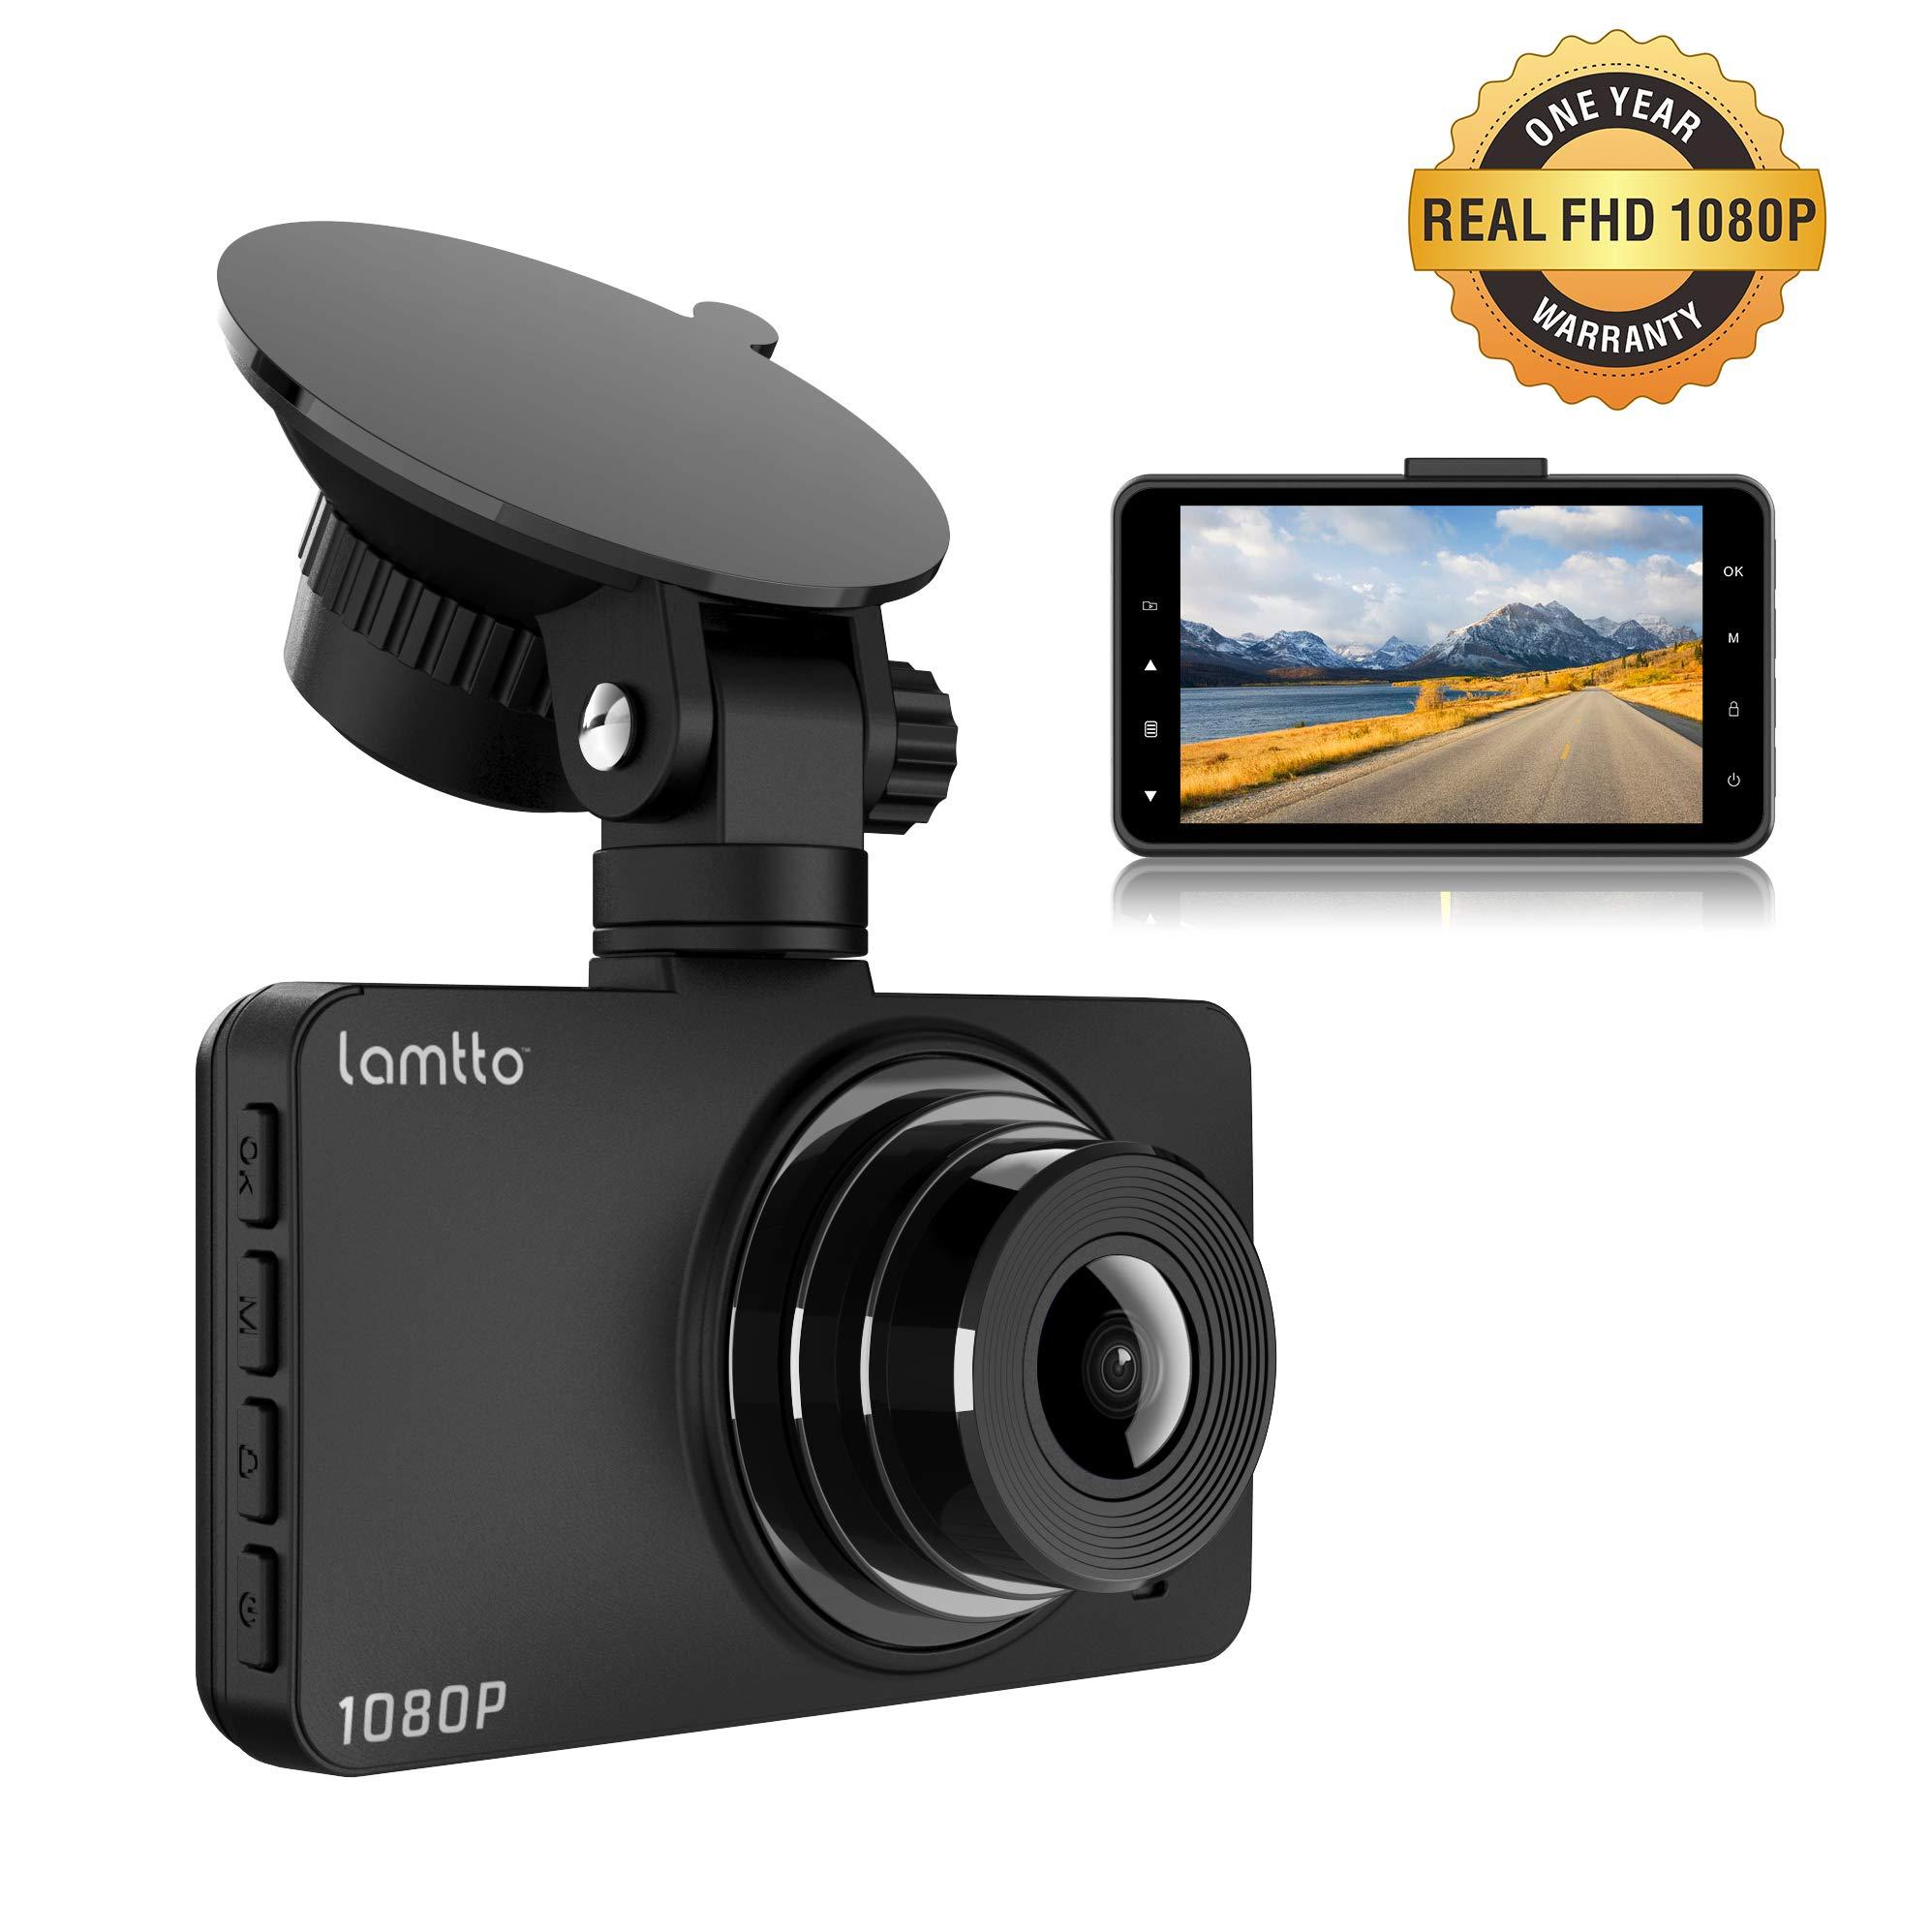 Dash-Cam-Dash-Cams-for-Cars-Lamtto-Car-Camera-1080P-Full-HD-3-LCD-Screen-170Wide-Angle-Dashboard-Camera-G-Sensor-WDR-Parking-Monitor-Loop-Recording-Motion-Detection-Car-Driving-Recorder-Camera